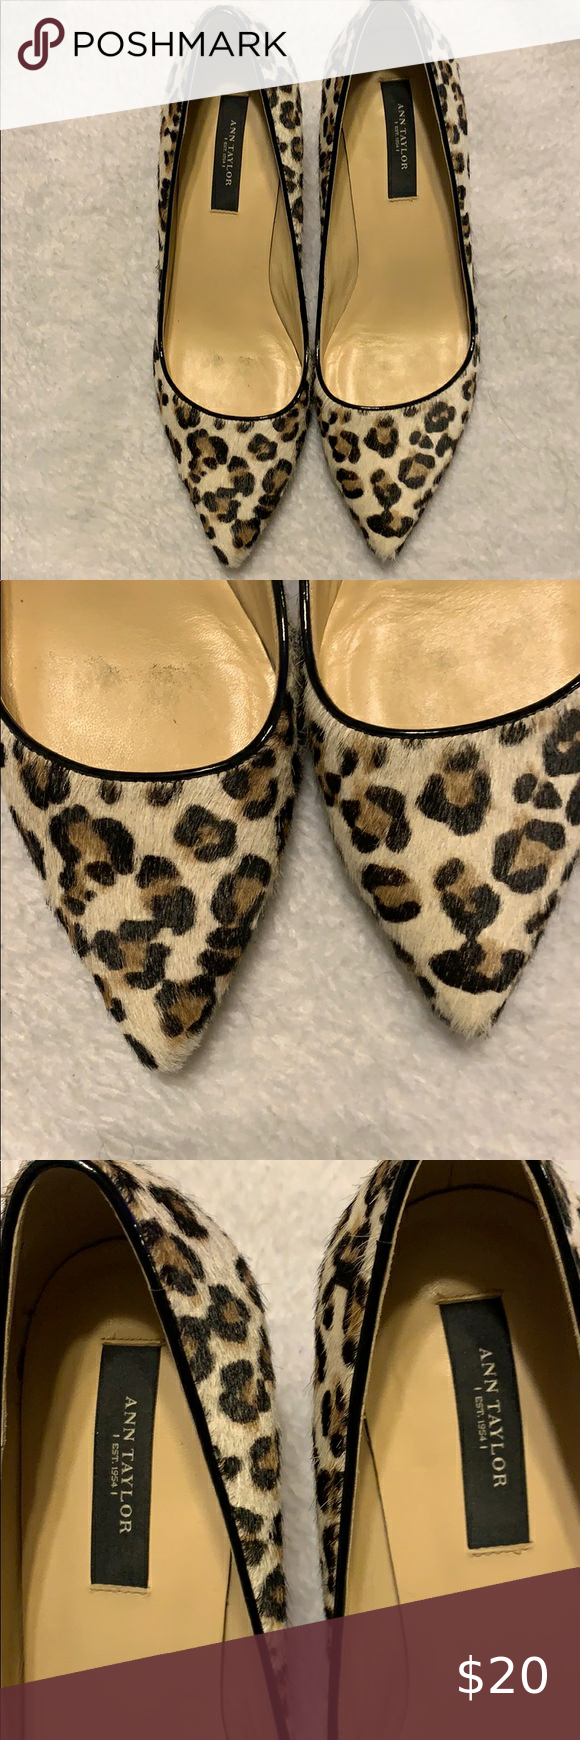 Ann Taylor Animal Print Kitten Heel Pumps 6 1 2 In 2020 Kitten Heel Pumps Shoes Women Heels Pumps Heels